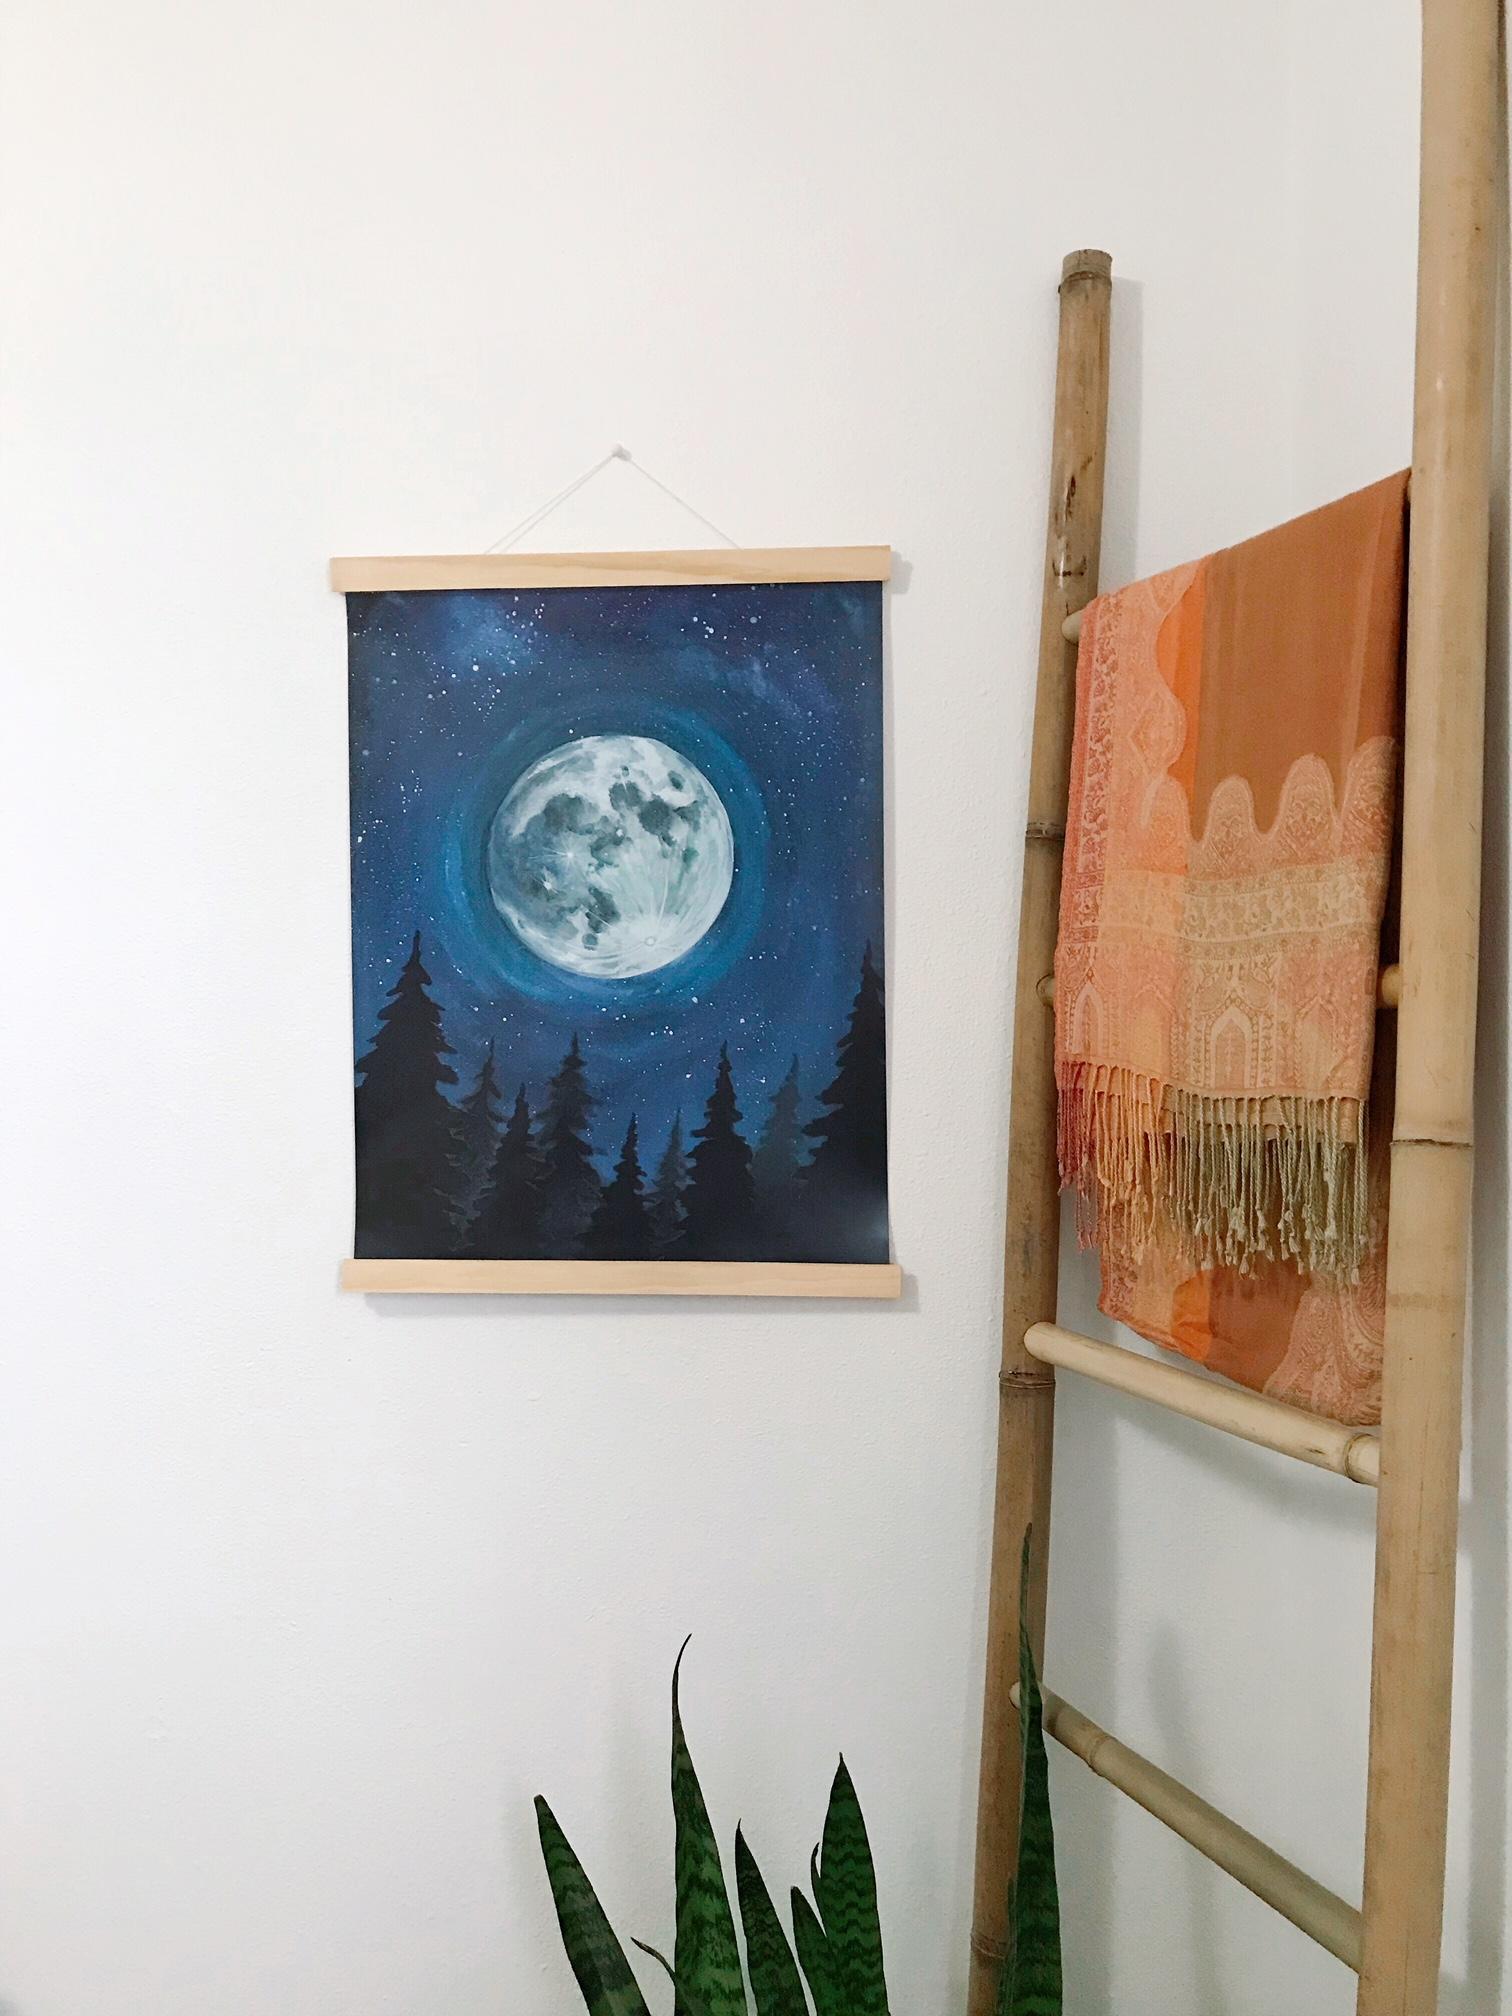 "Lunar Sky Poster & Wood Magnet Hanger -  18""x24"" poster and 18.5"" handmade pine wood magnet hanger."